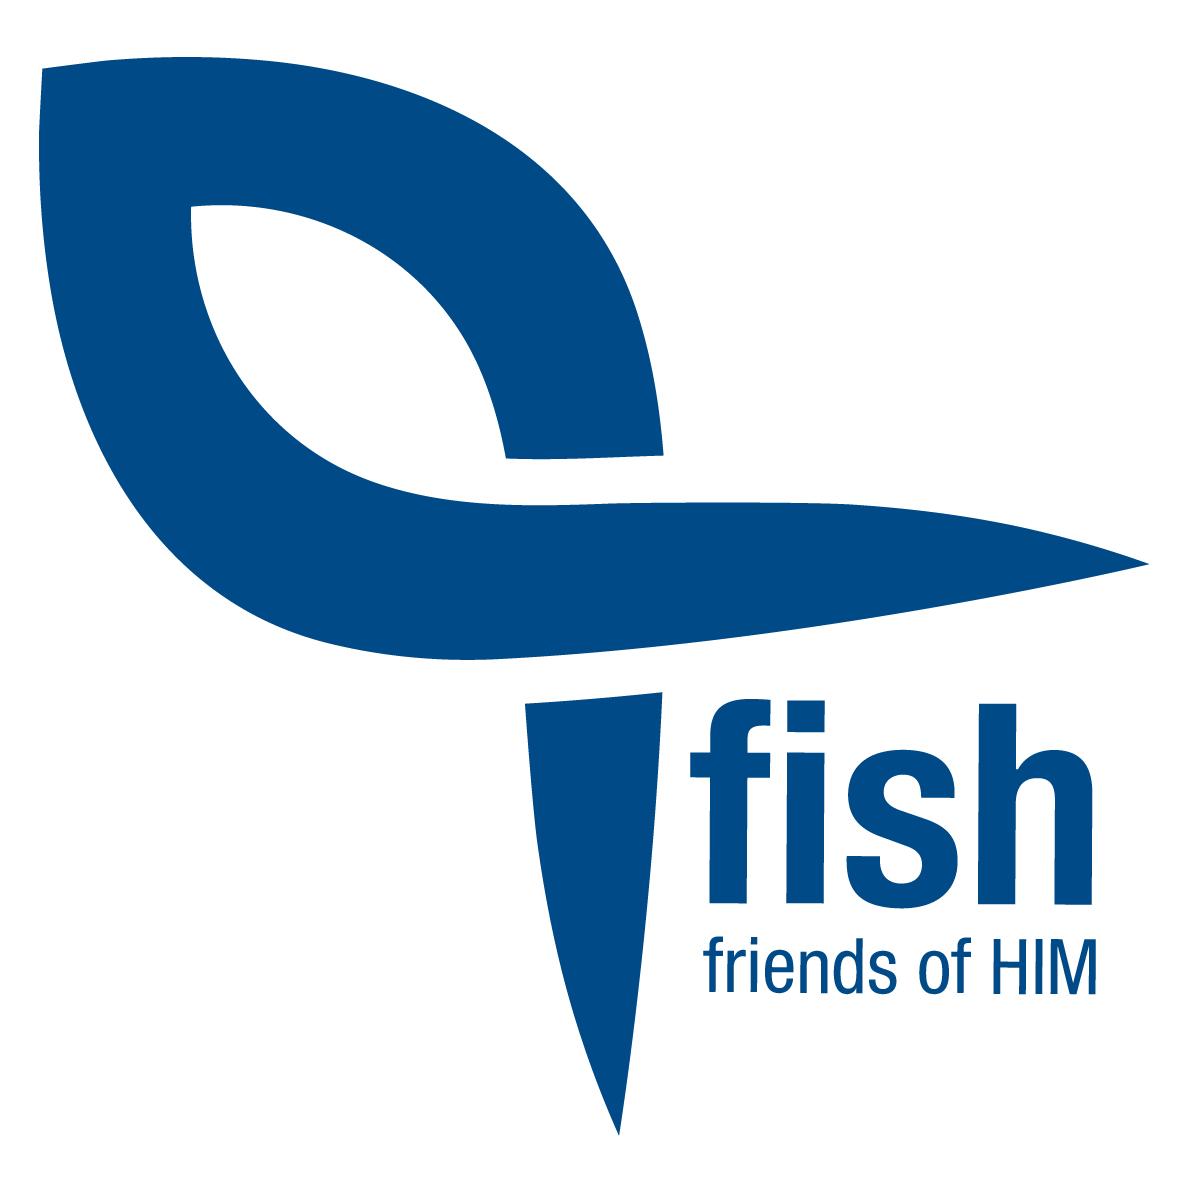 Fish Decal Cross-01.jpg